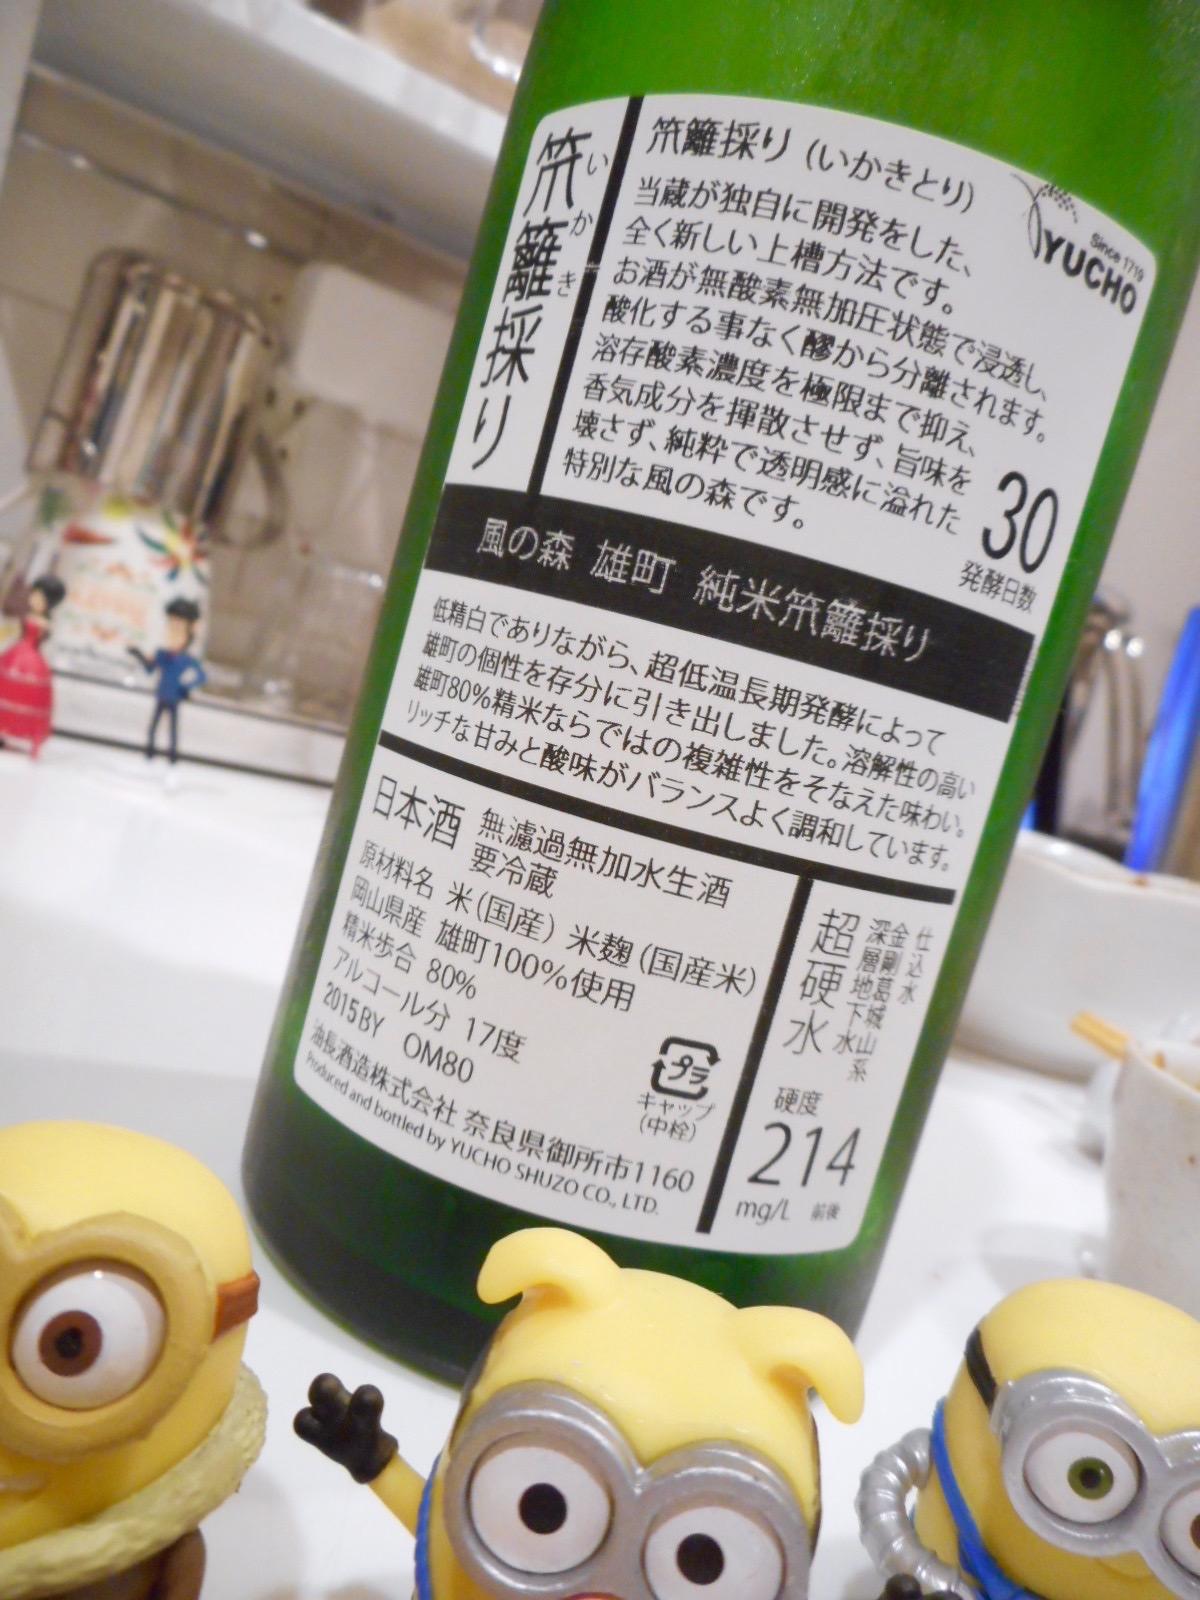 kazenomori_ikakitori_omachi80_27by2.jpg